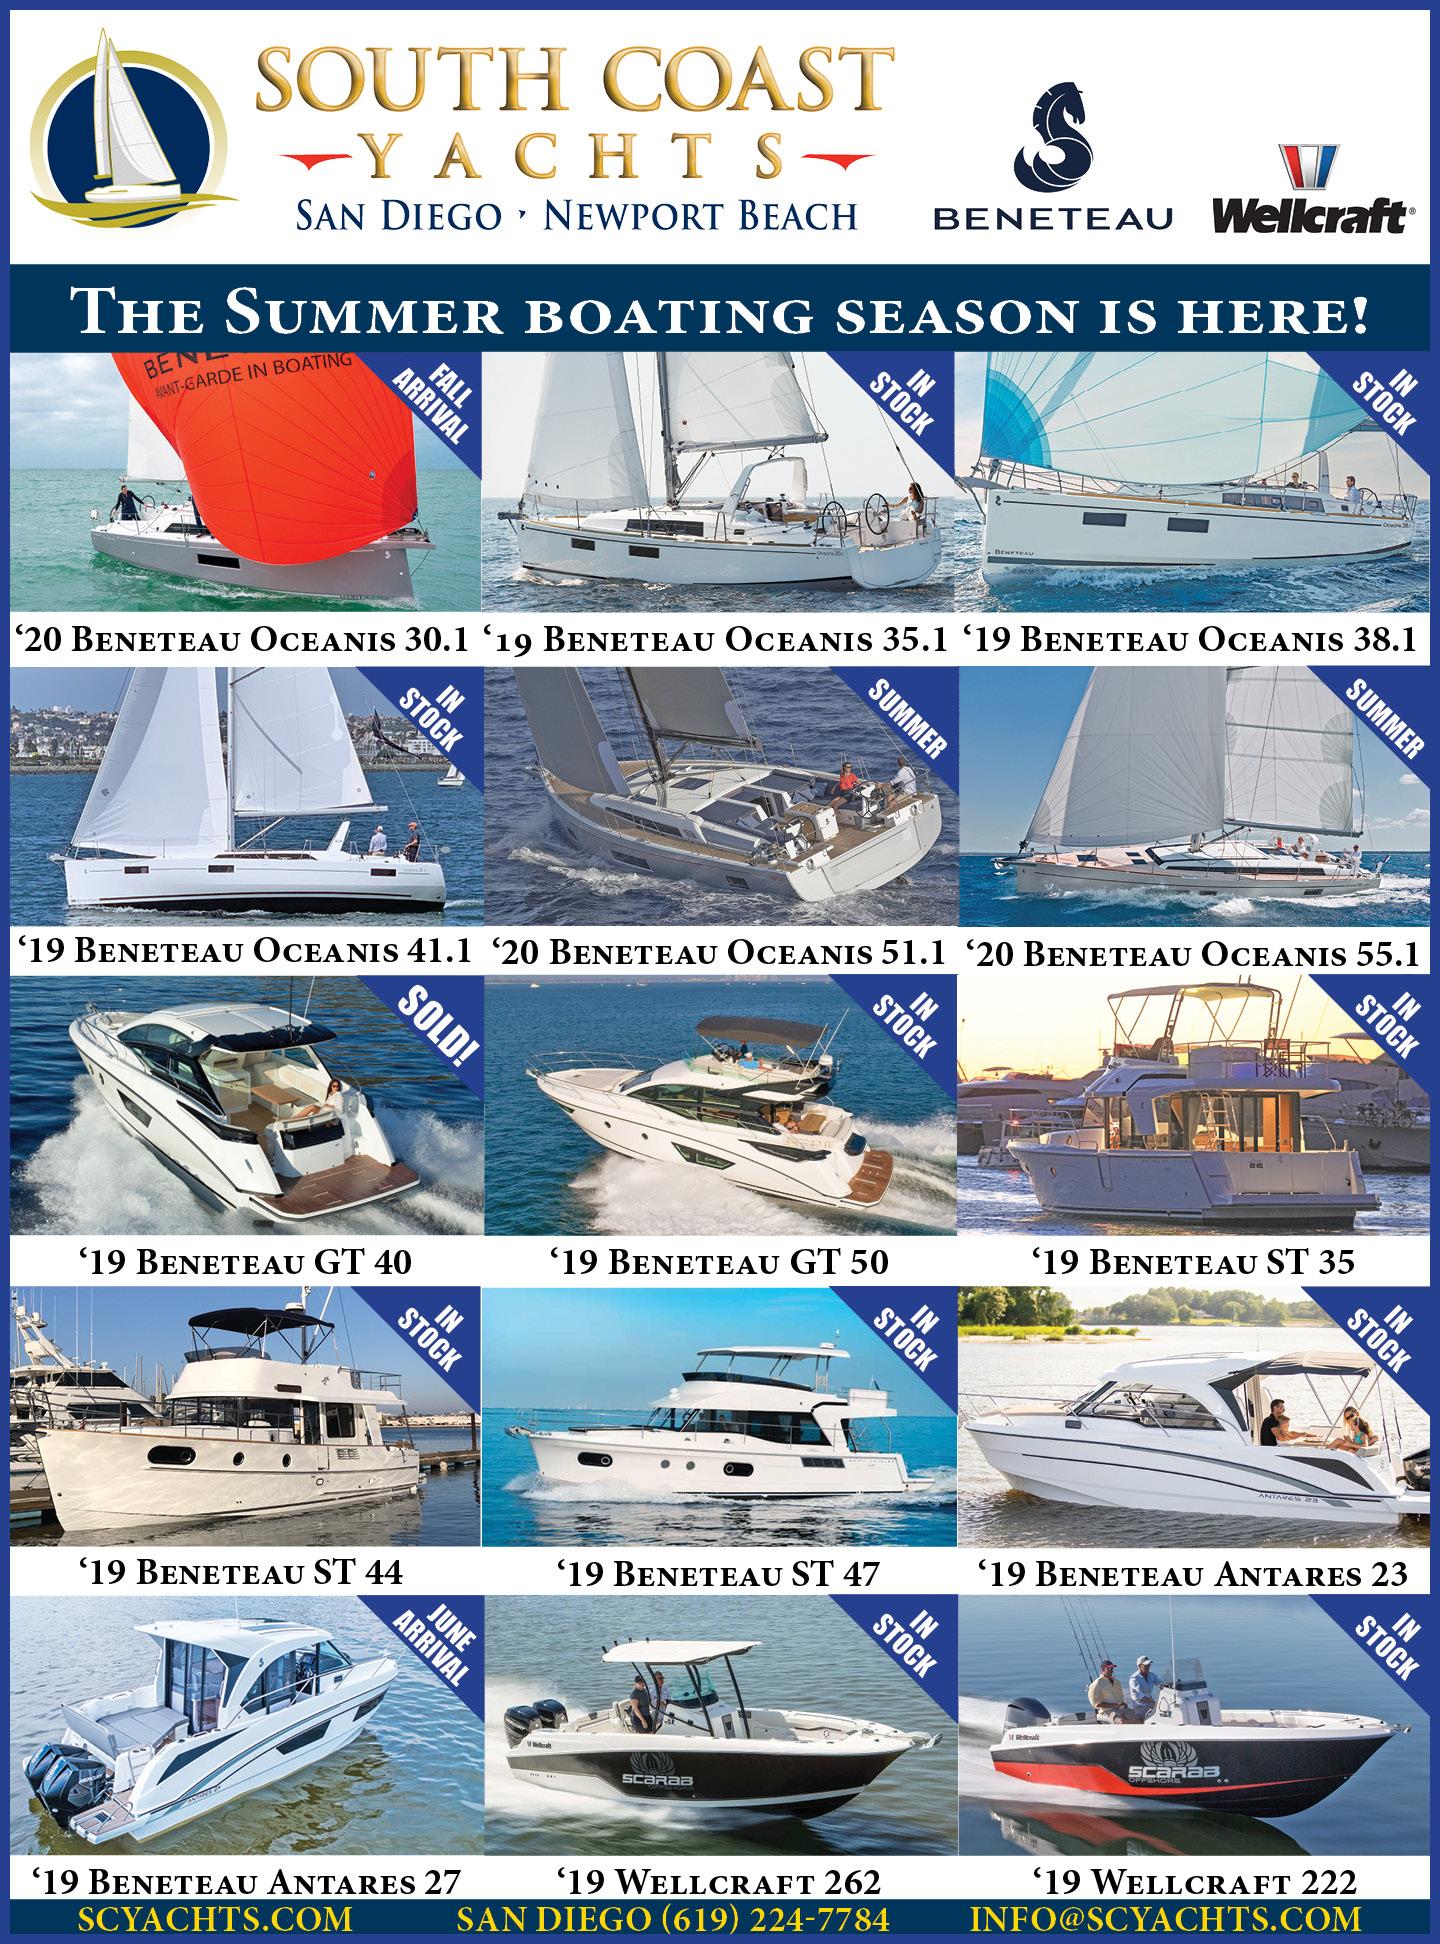 Sailboat Specials South Coast Yachts